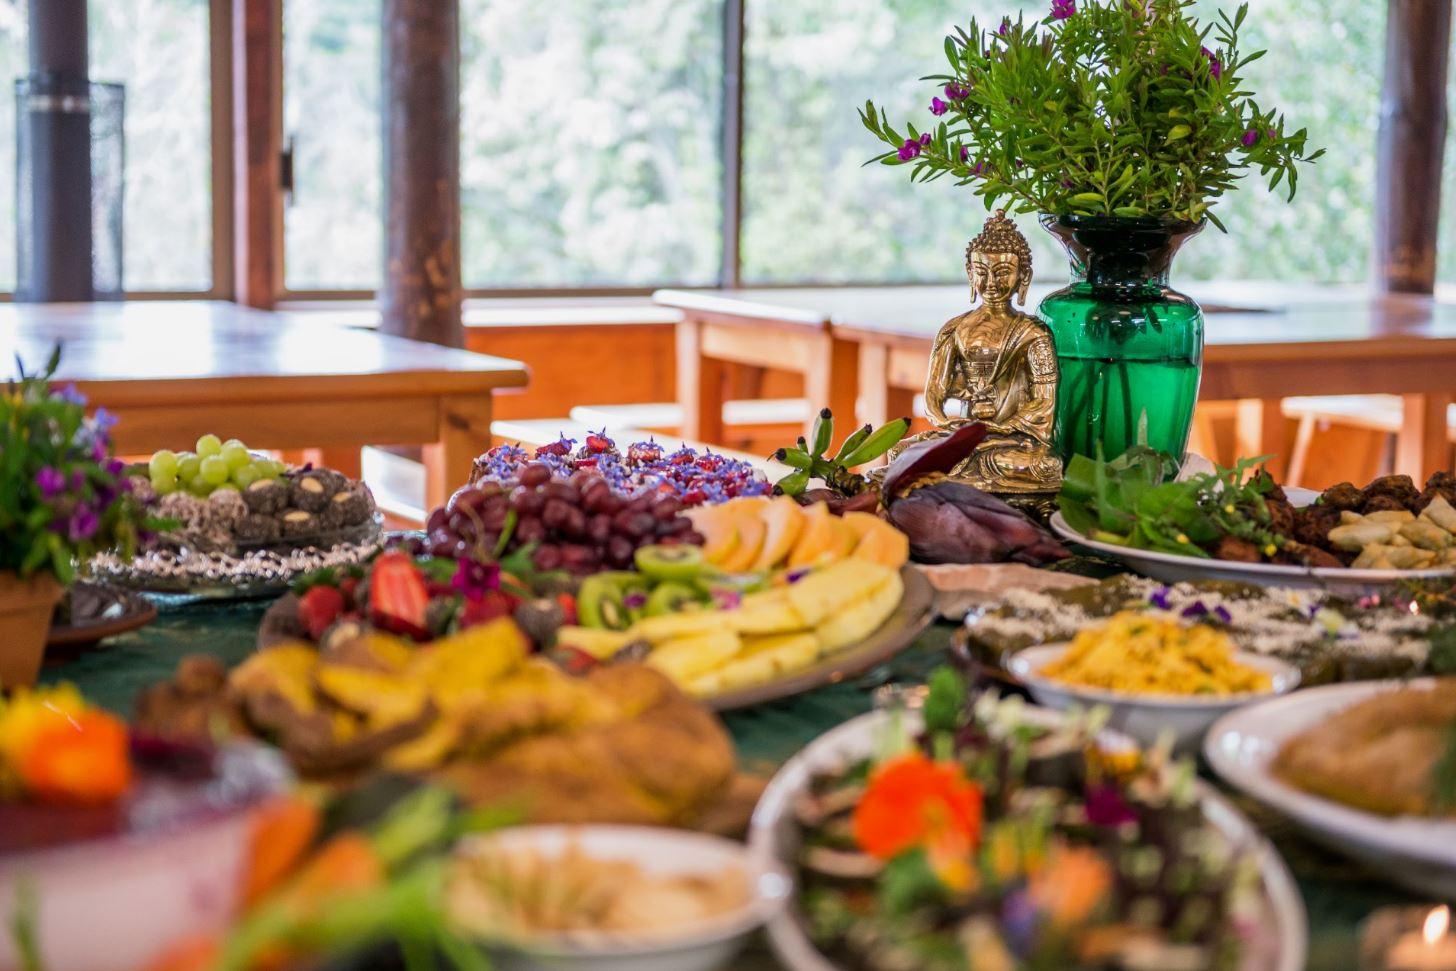 http://kawaipurapura.co.nz/wp-content/uploads/2017/07/food-kawai-purapura-4.jpg